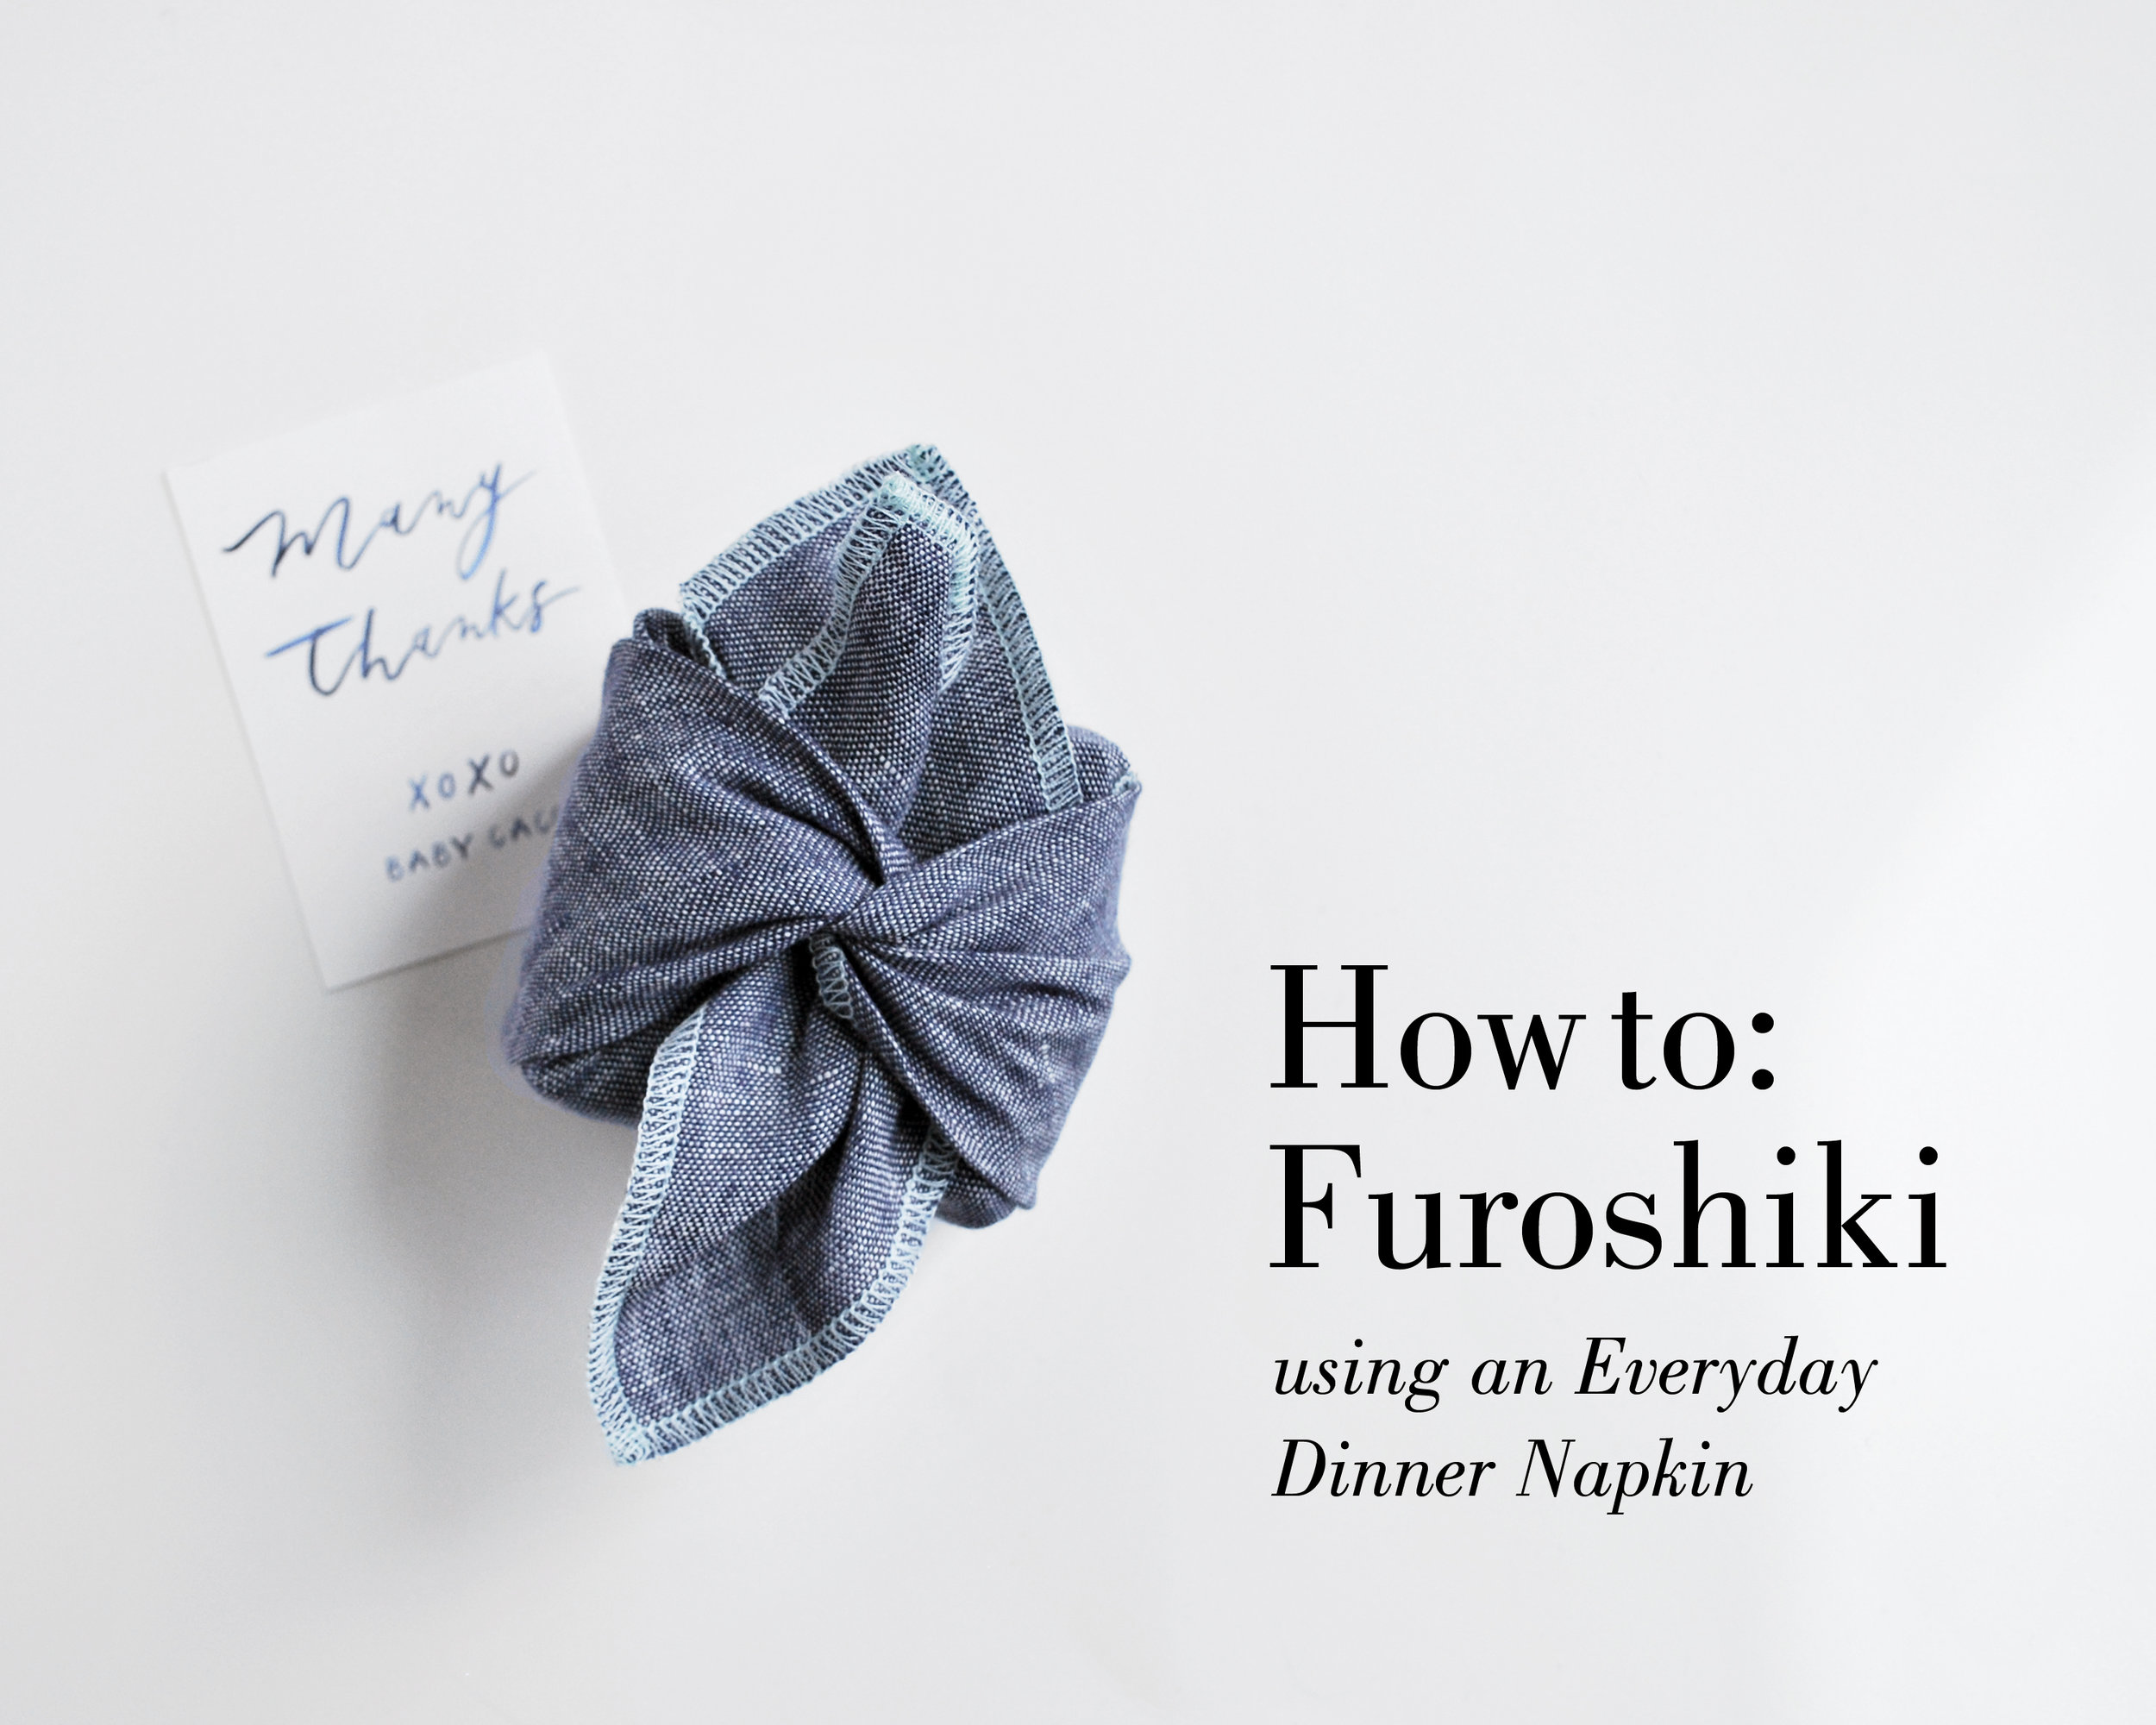 how-to-furoshiki-linen-everyday-co-gift-eco-wrap